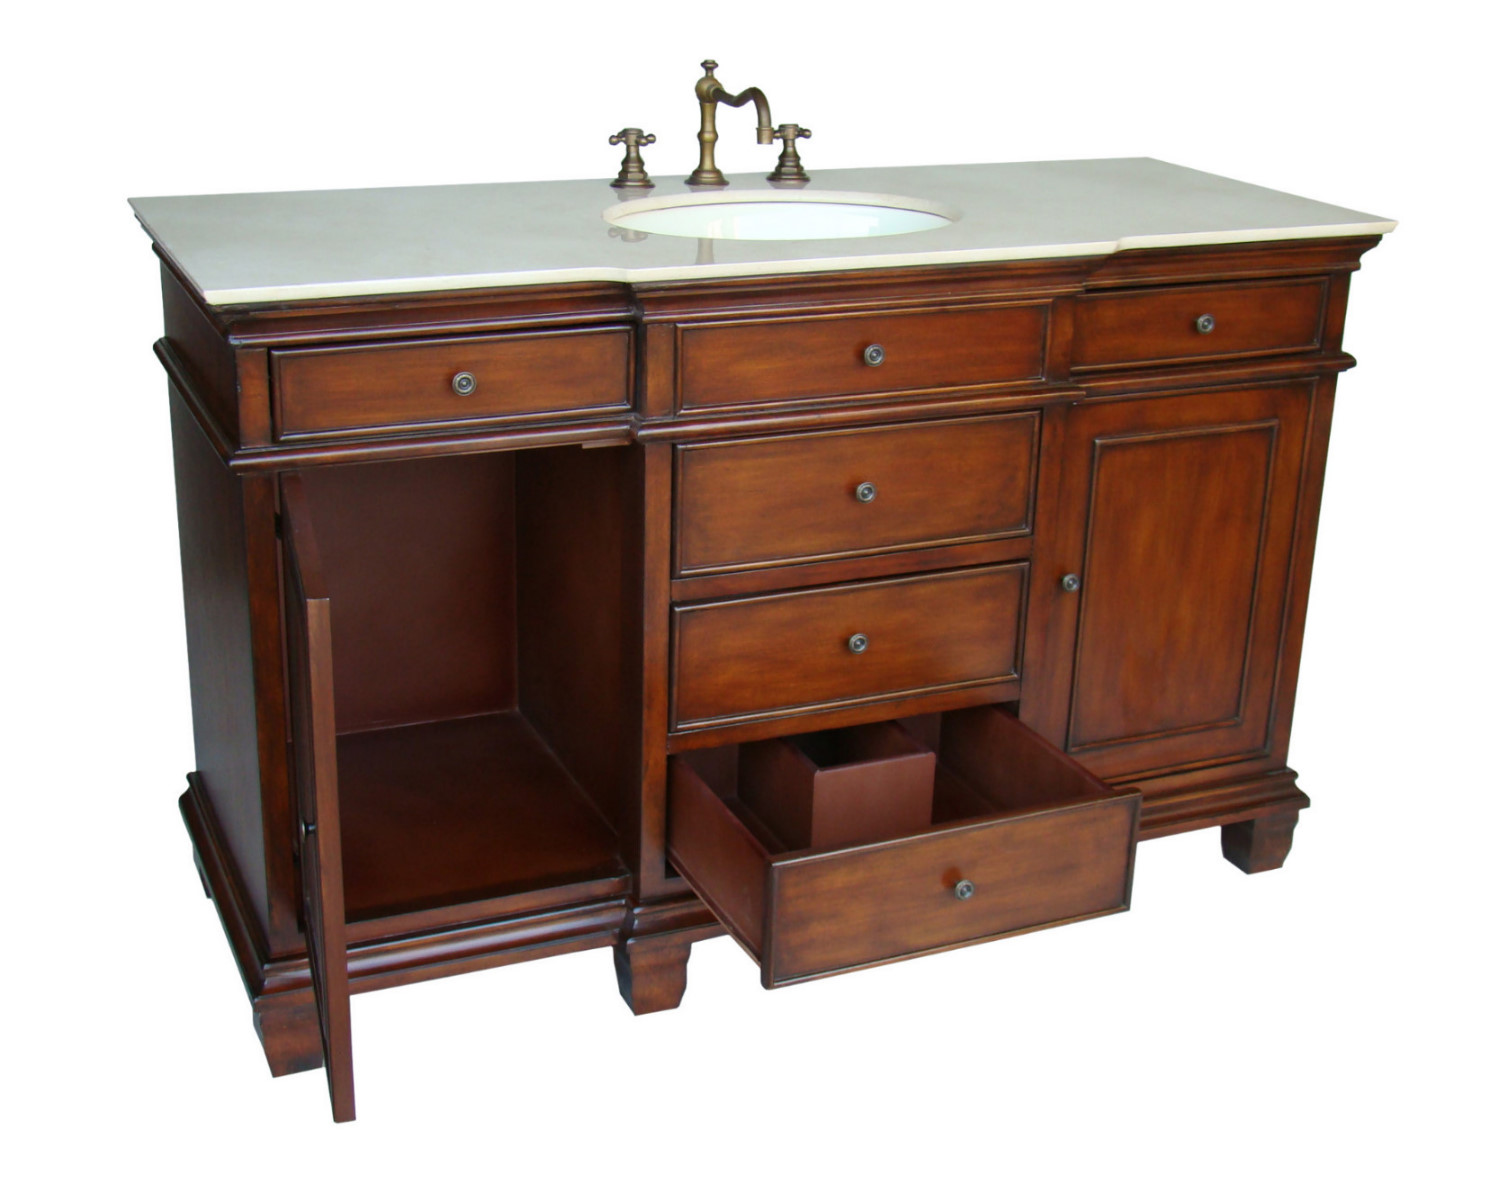 56 Inch Dunsmore Vanity Single Sink Vanity Chestnut